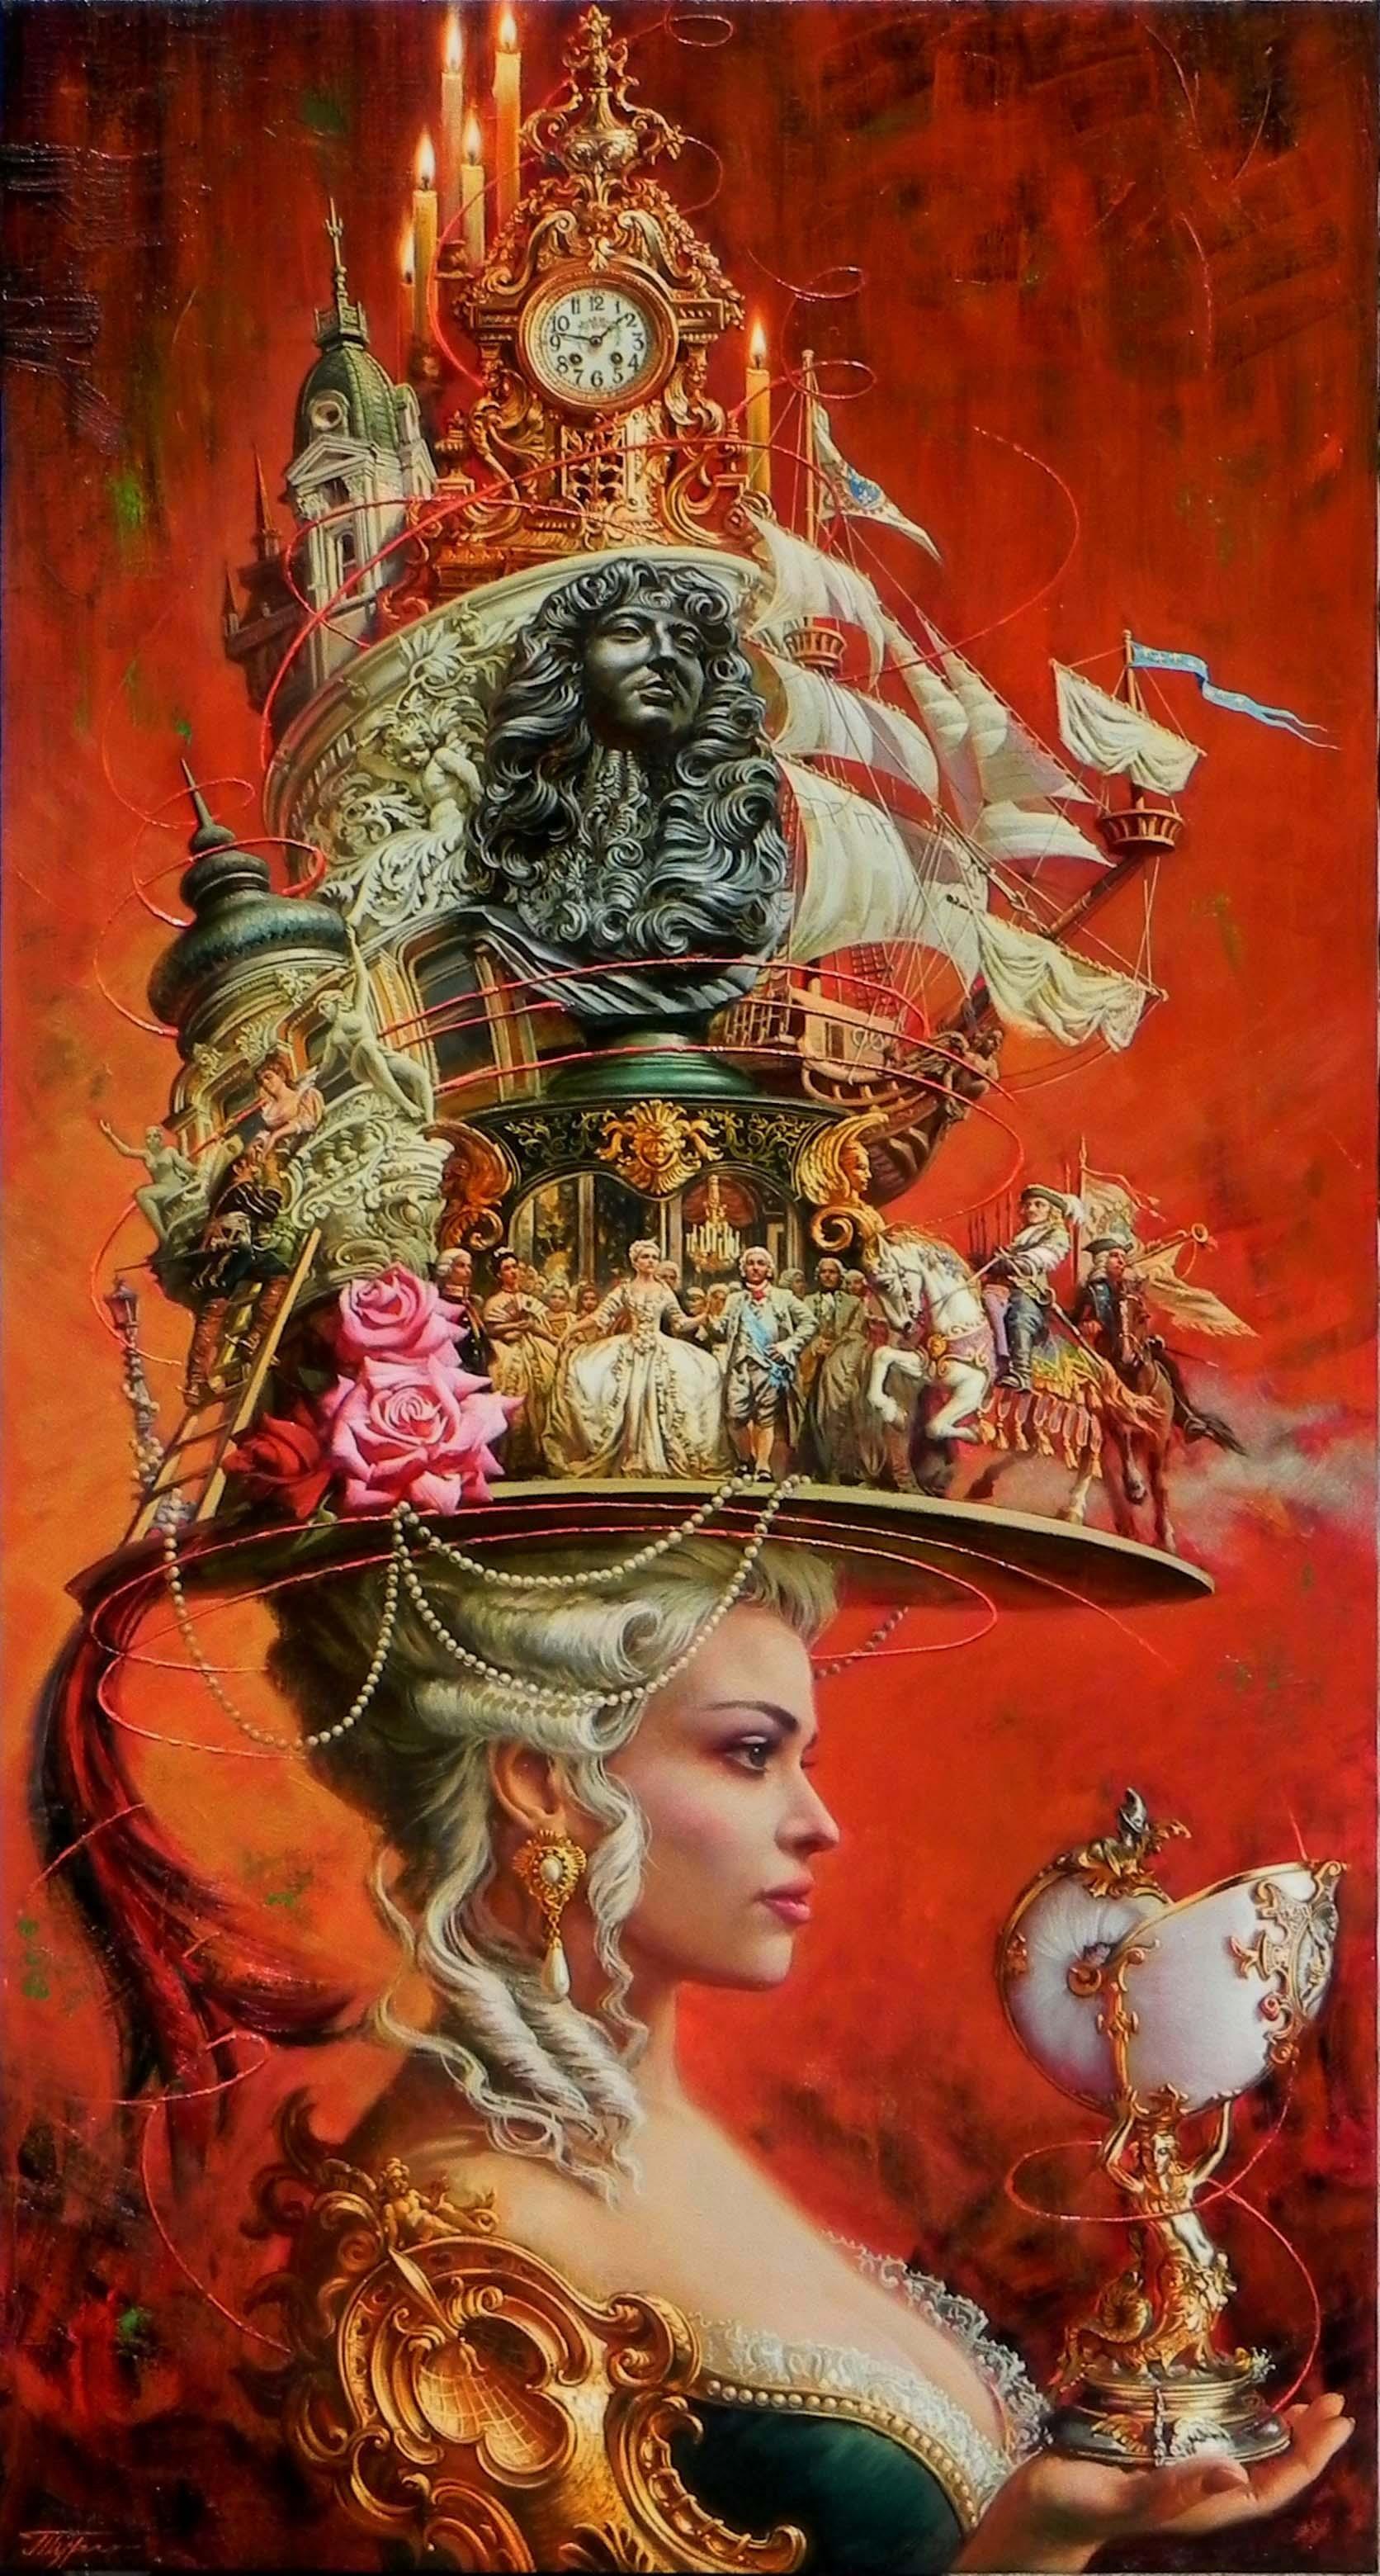 """Alluring Times"", Oleg Turchin, Surrealism, Sophisticated, Elaborate, Hat"